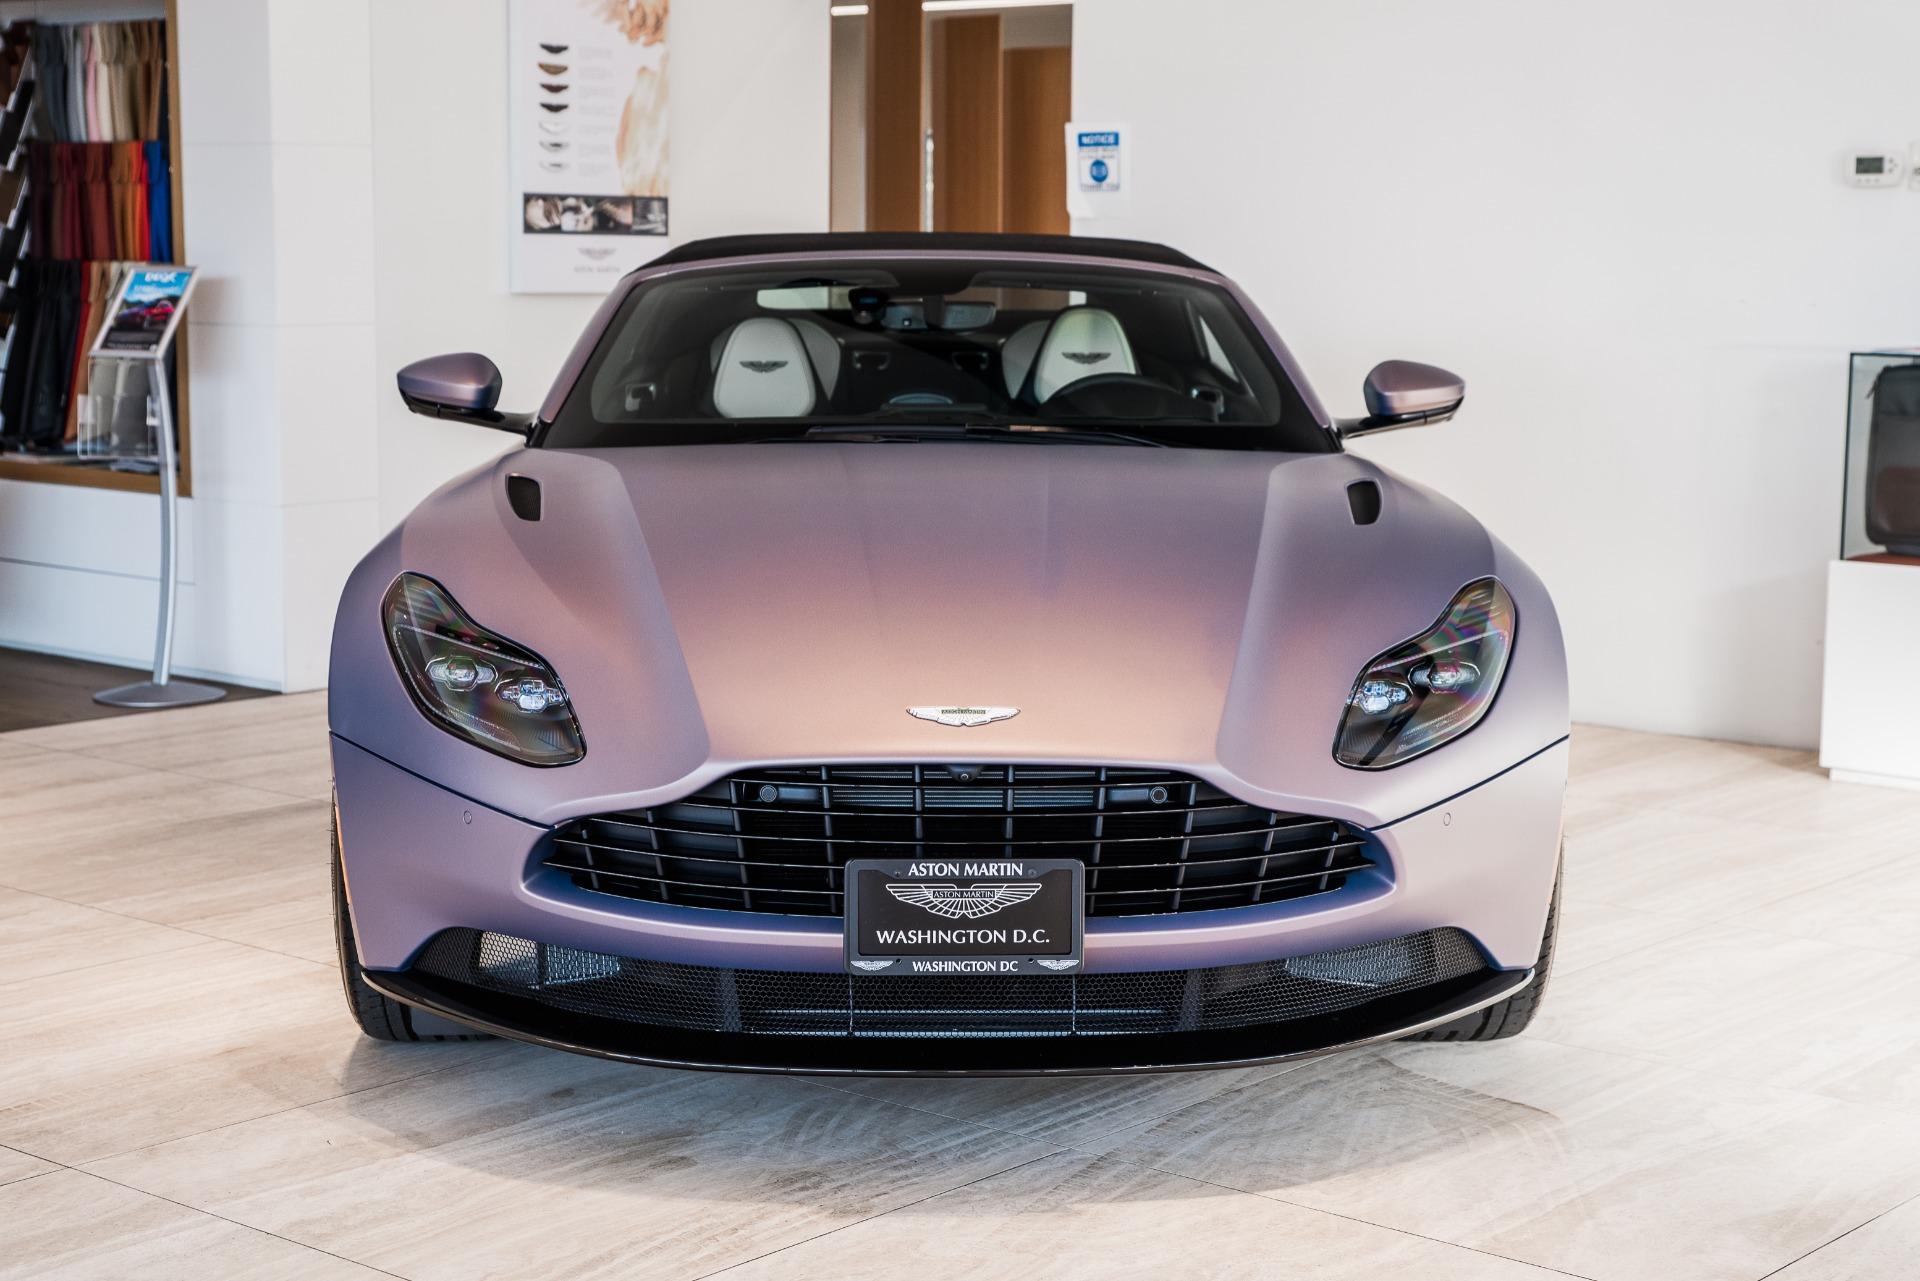 New-2021-Aston-Martin-DB11